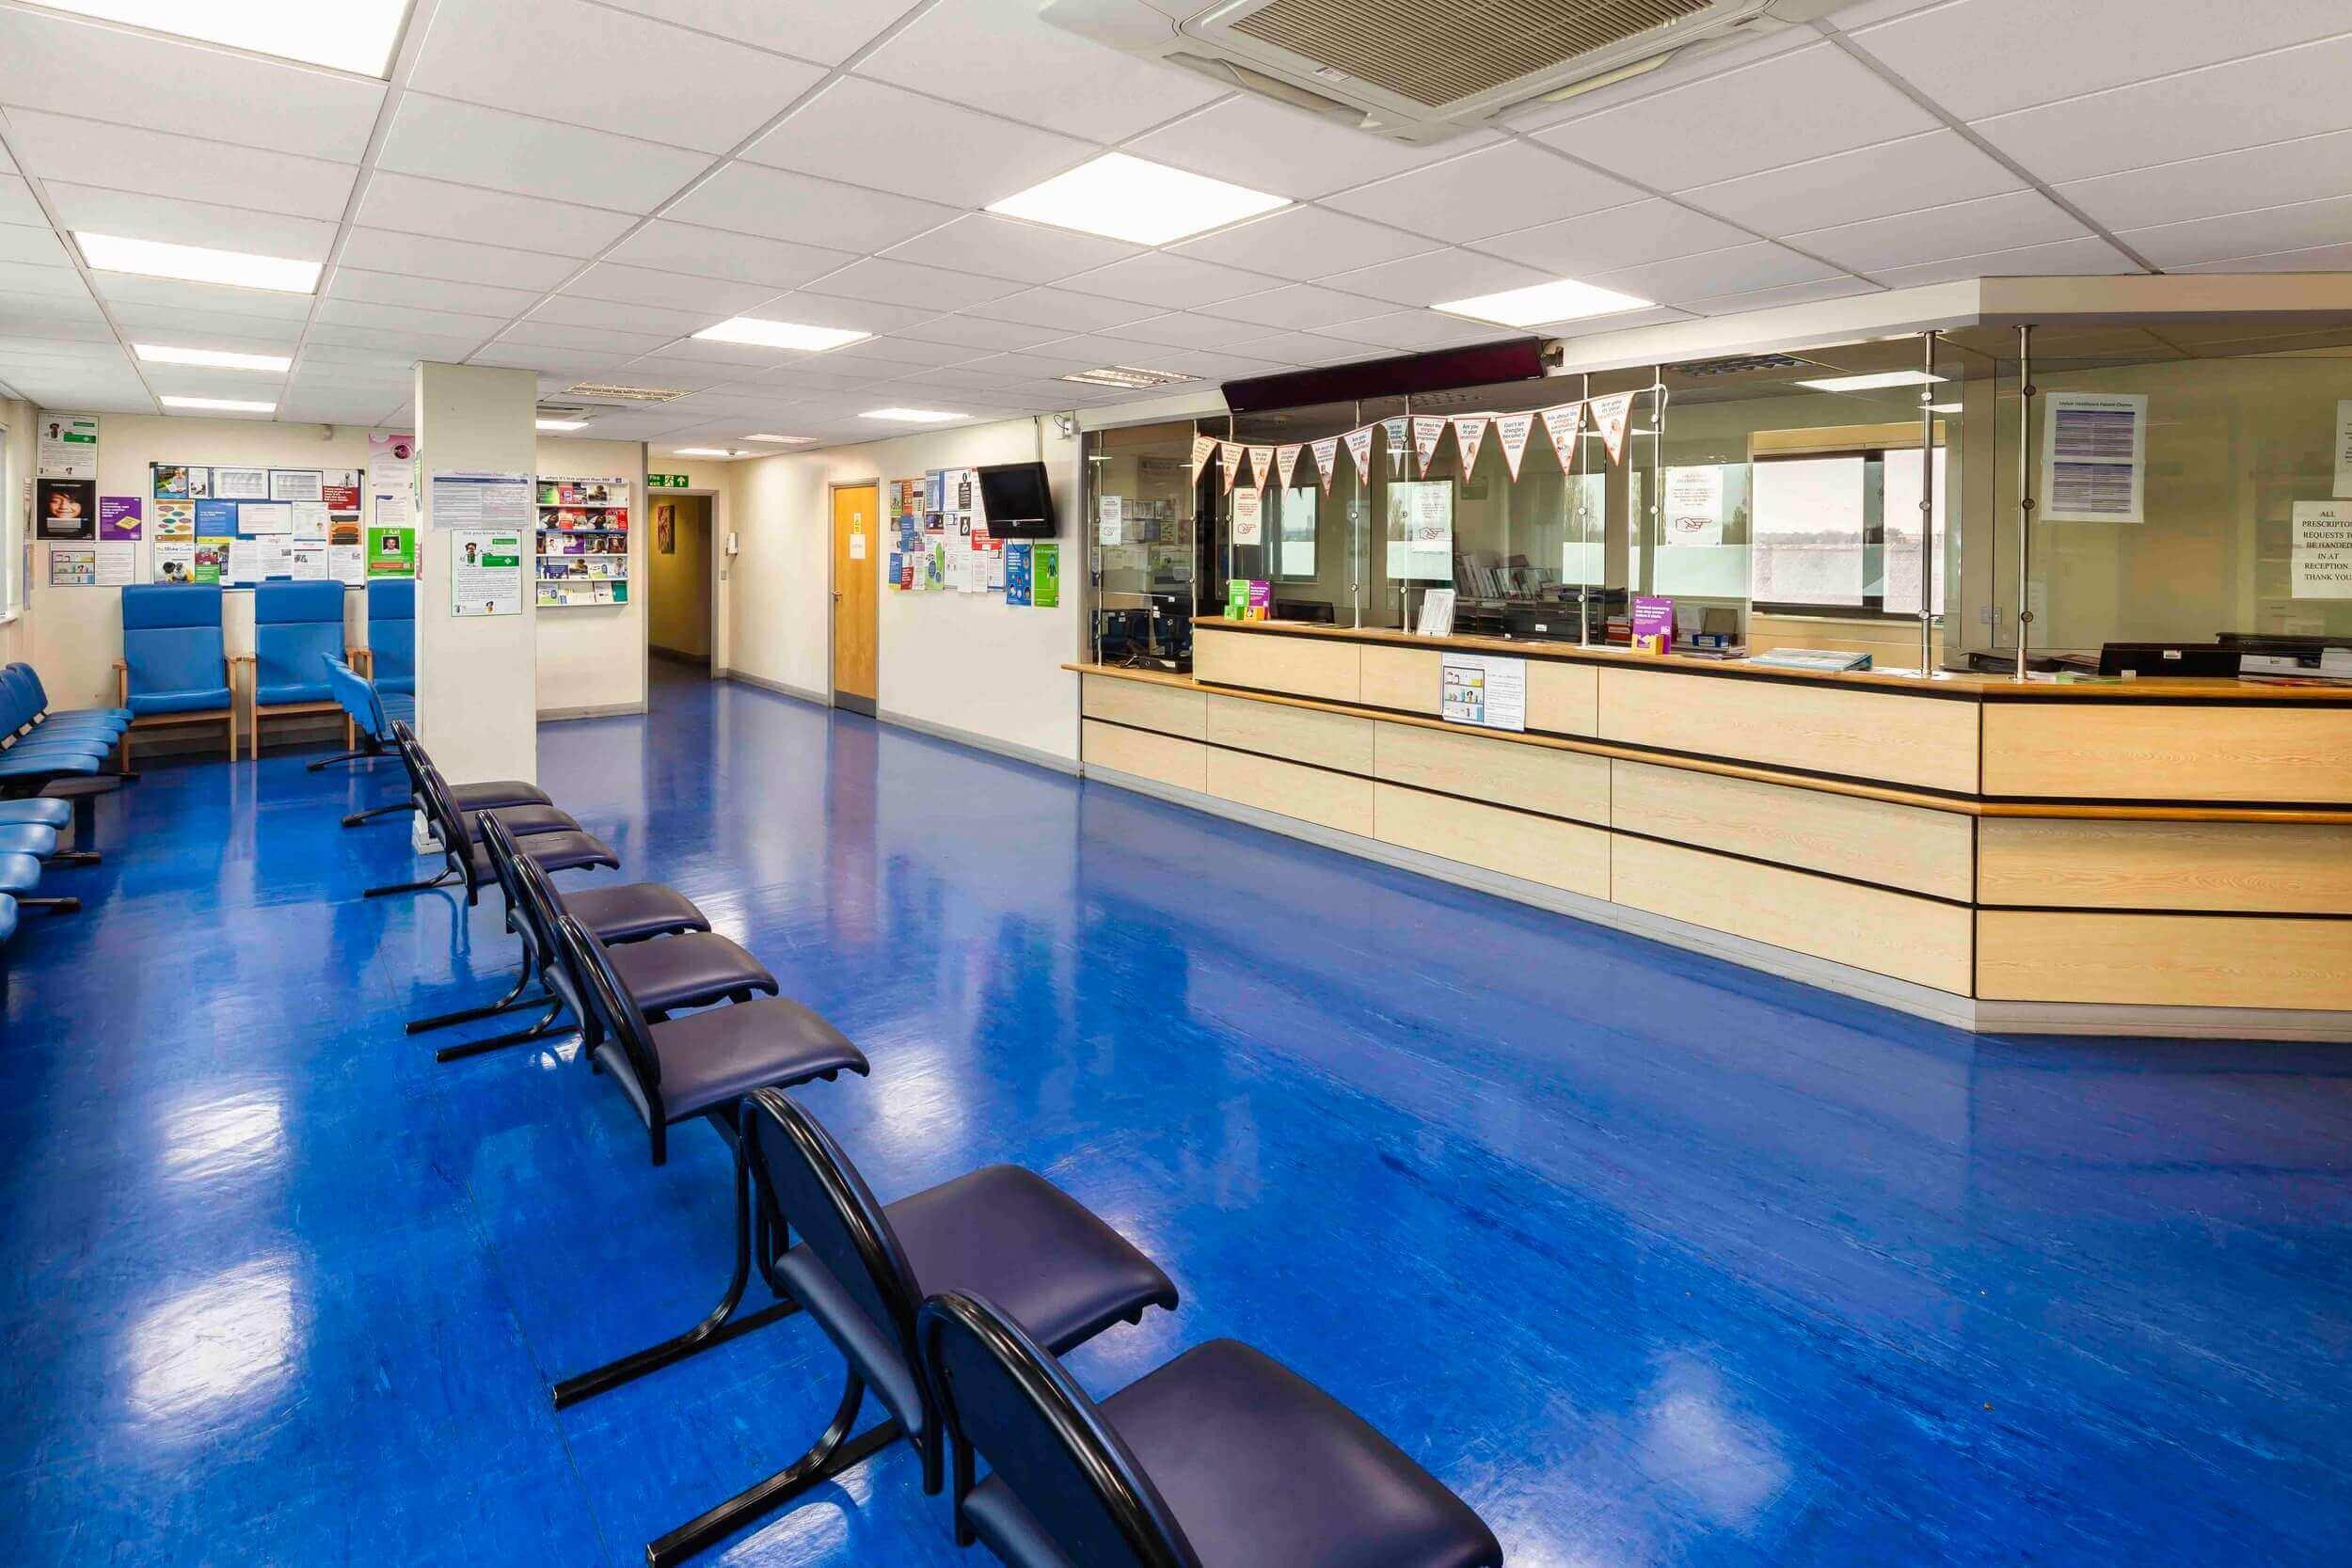 London Circumcision Centre Leyton Reception2.jpg